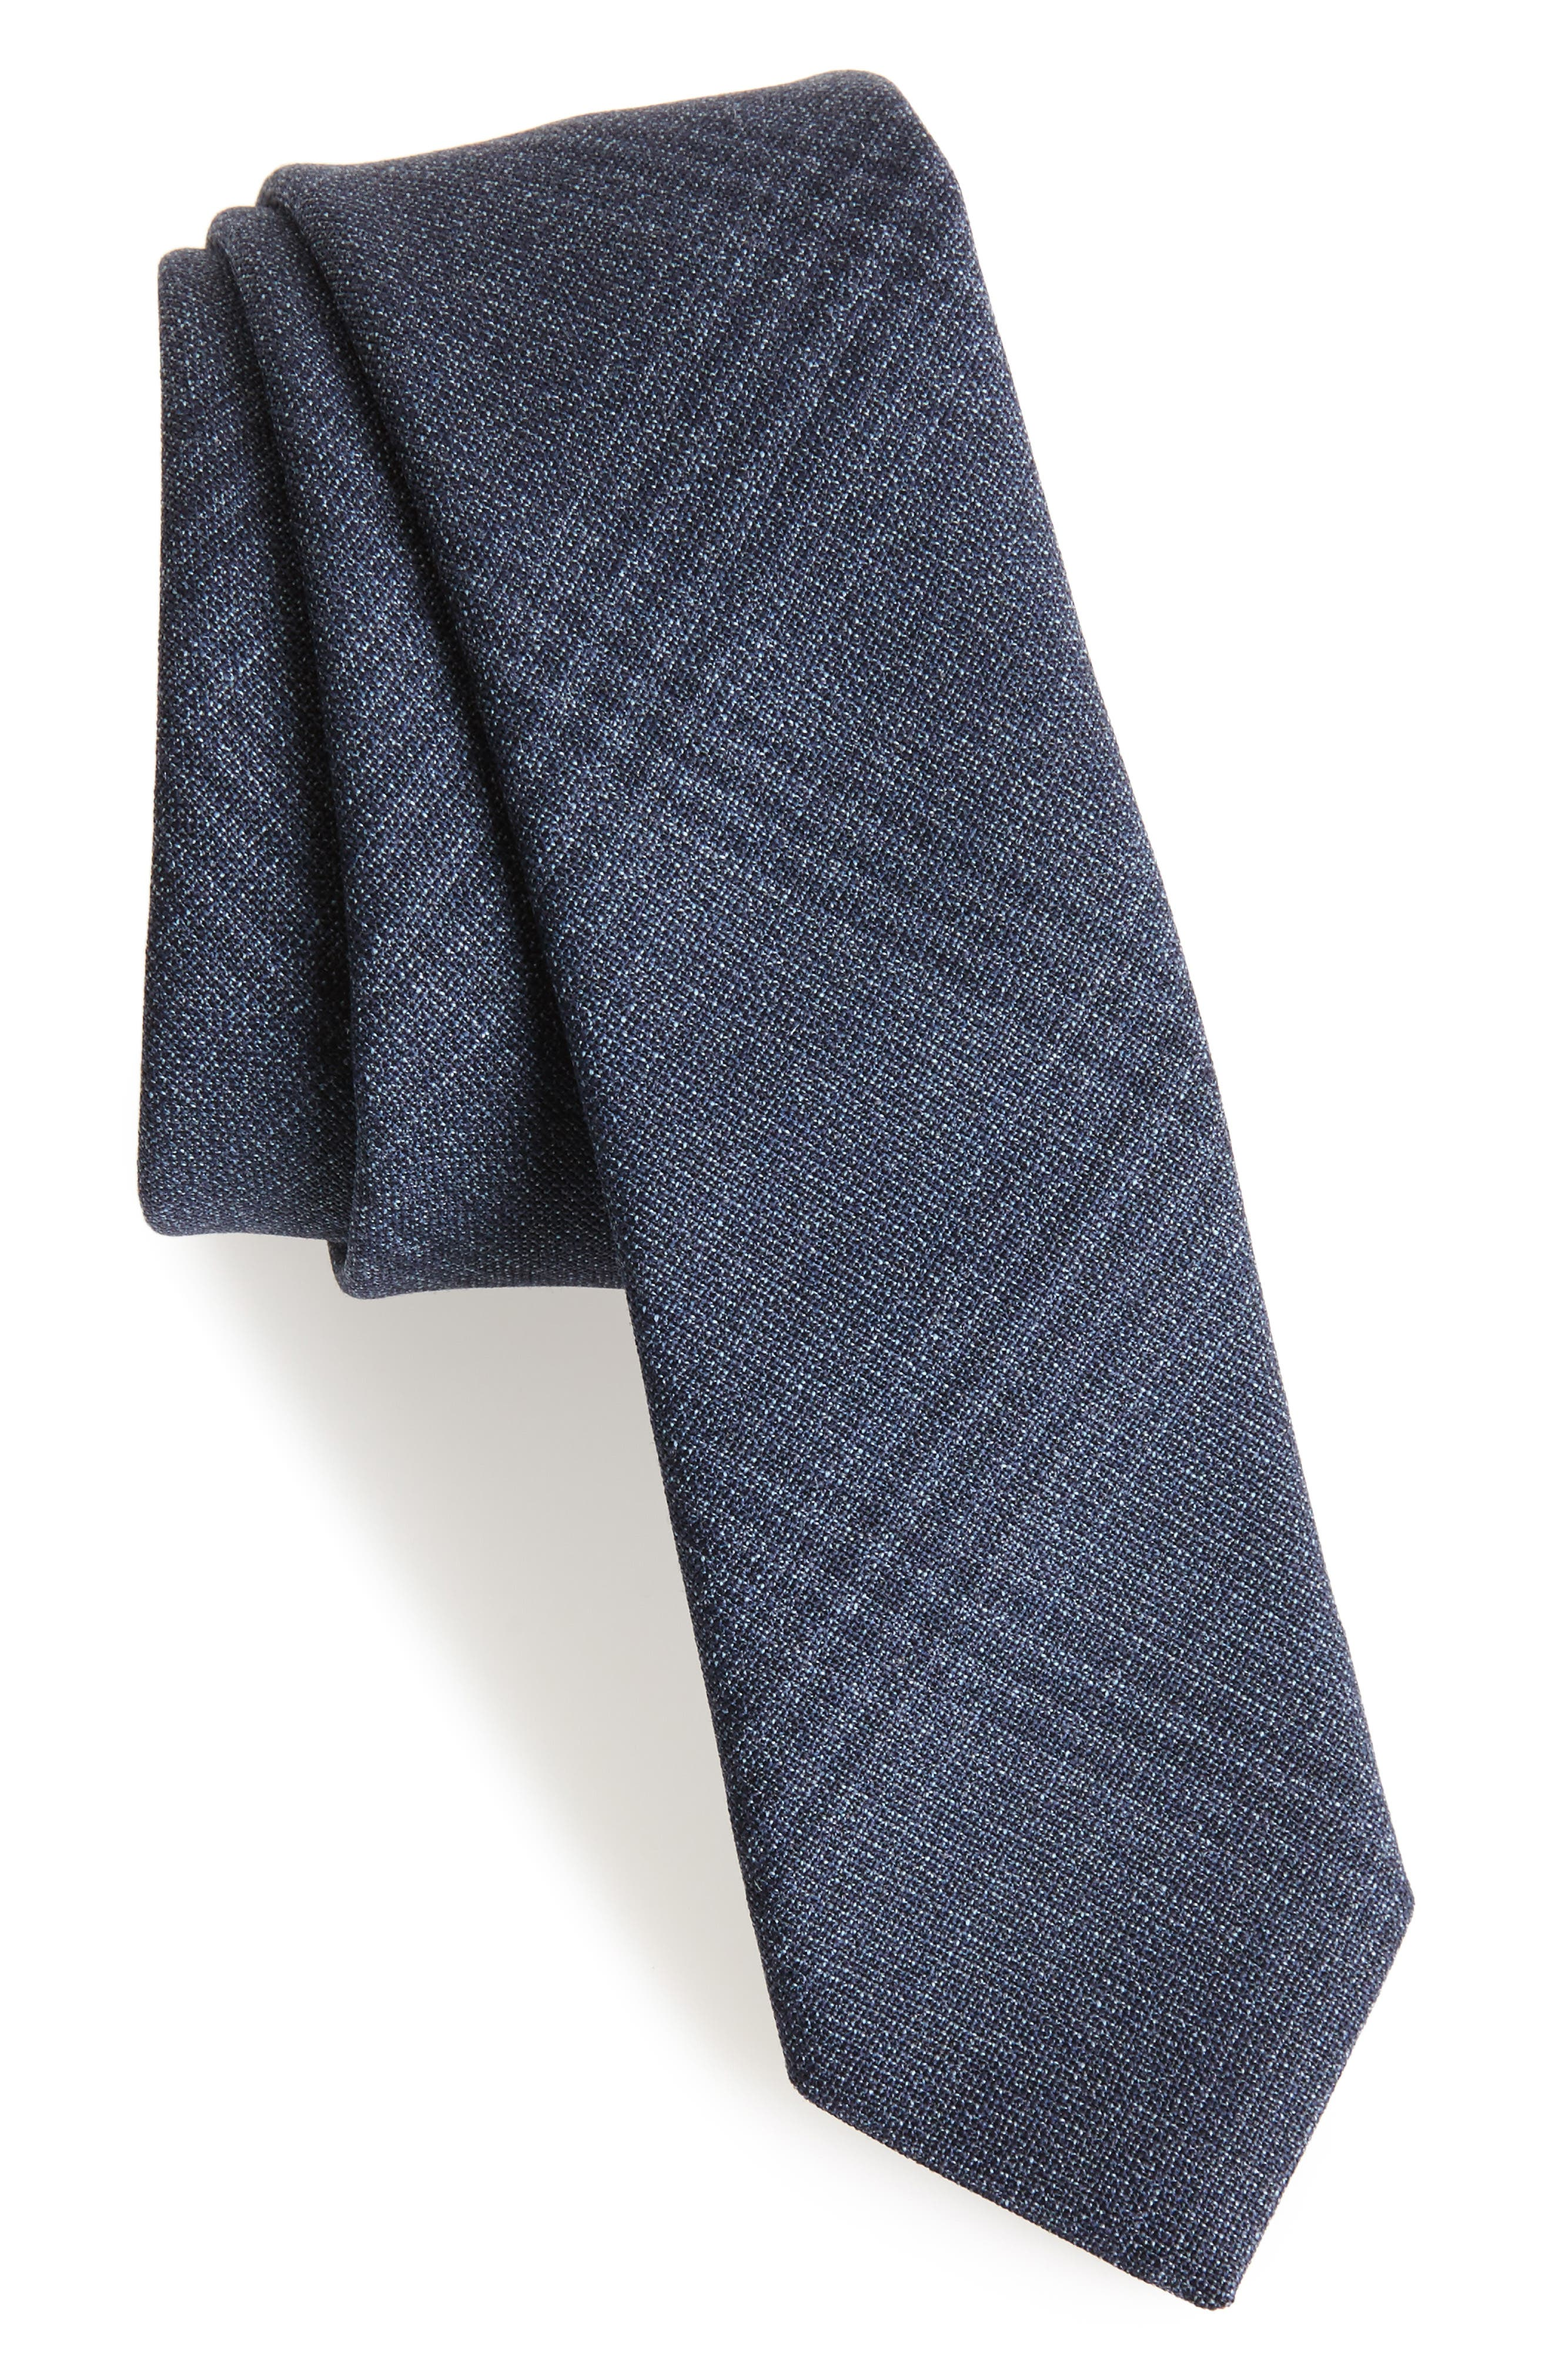 Plaid Wool Tie,                             Main thumbnail 1, color,                             Grey